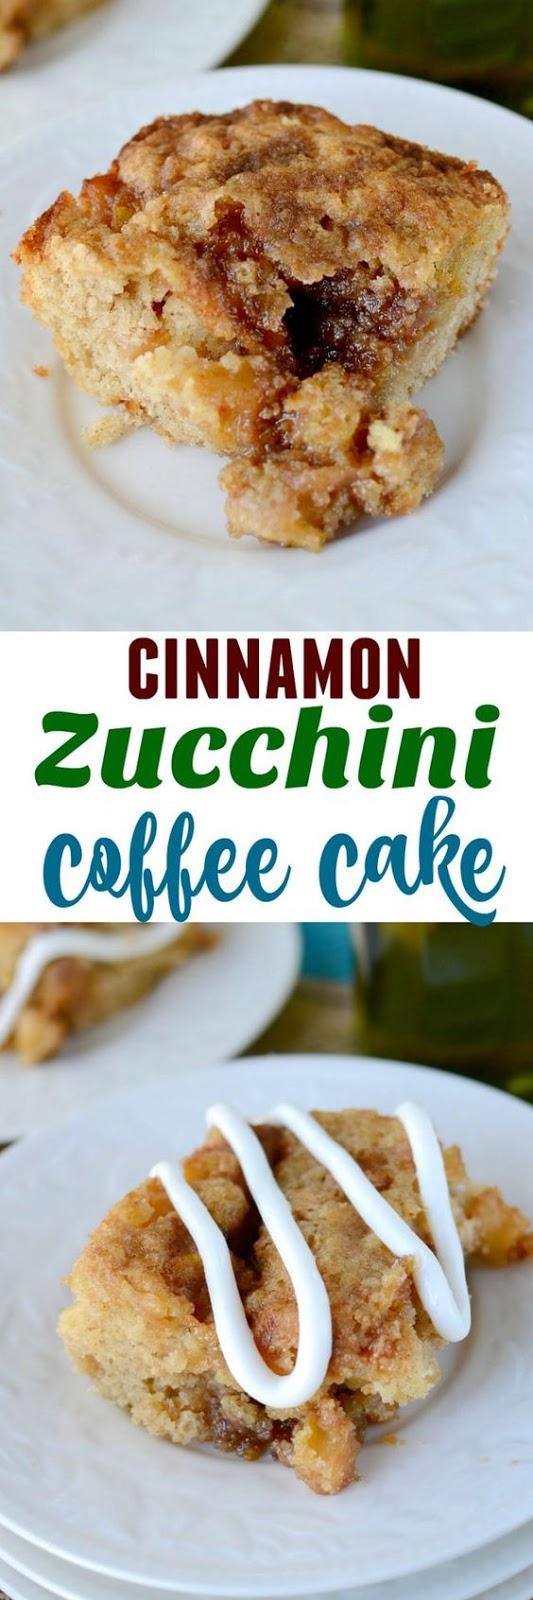 CINNAMON ZUCCHINI COFFEE CAKE